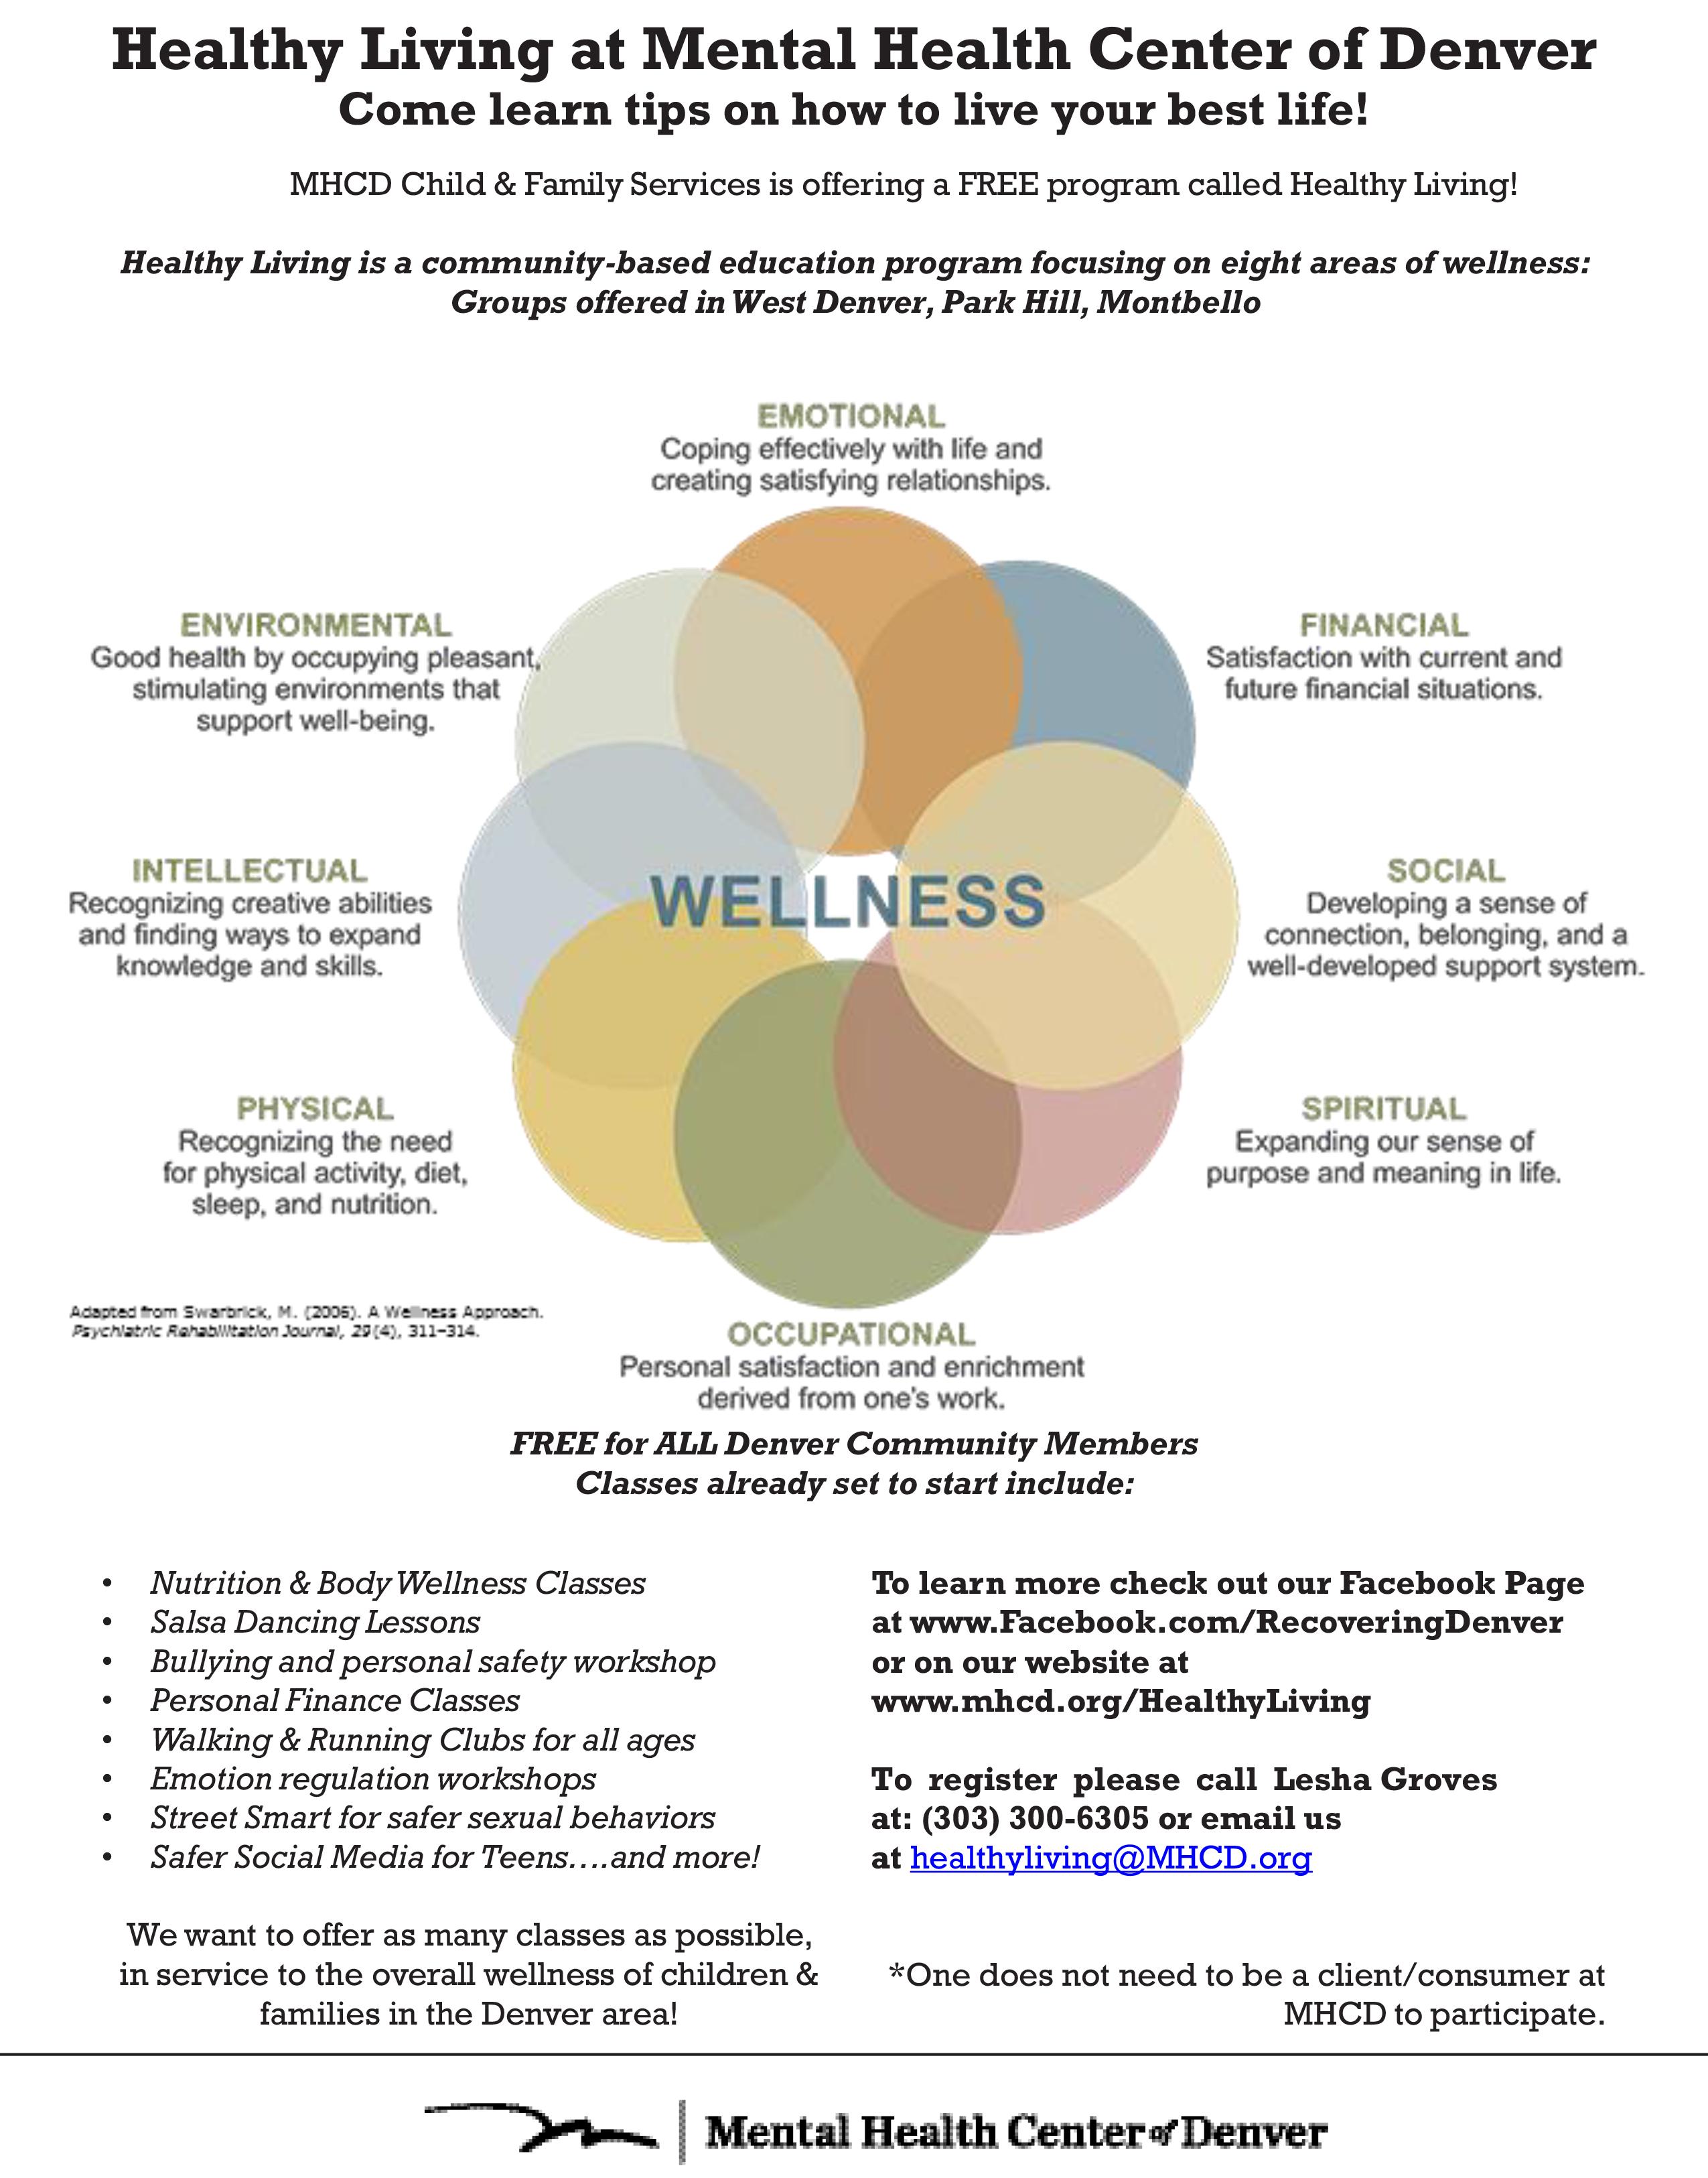 8 Dimension Wellness Wheel Flyer